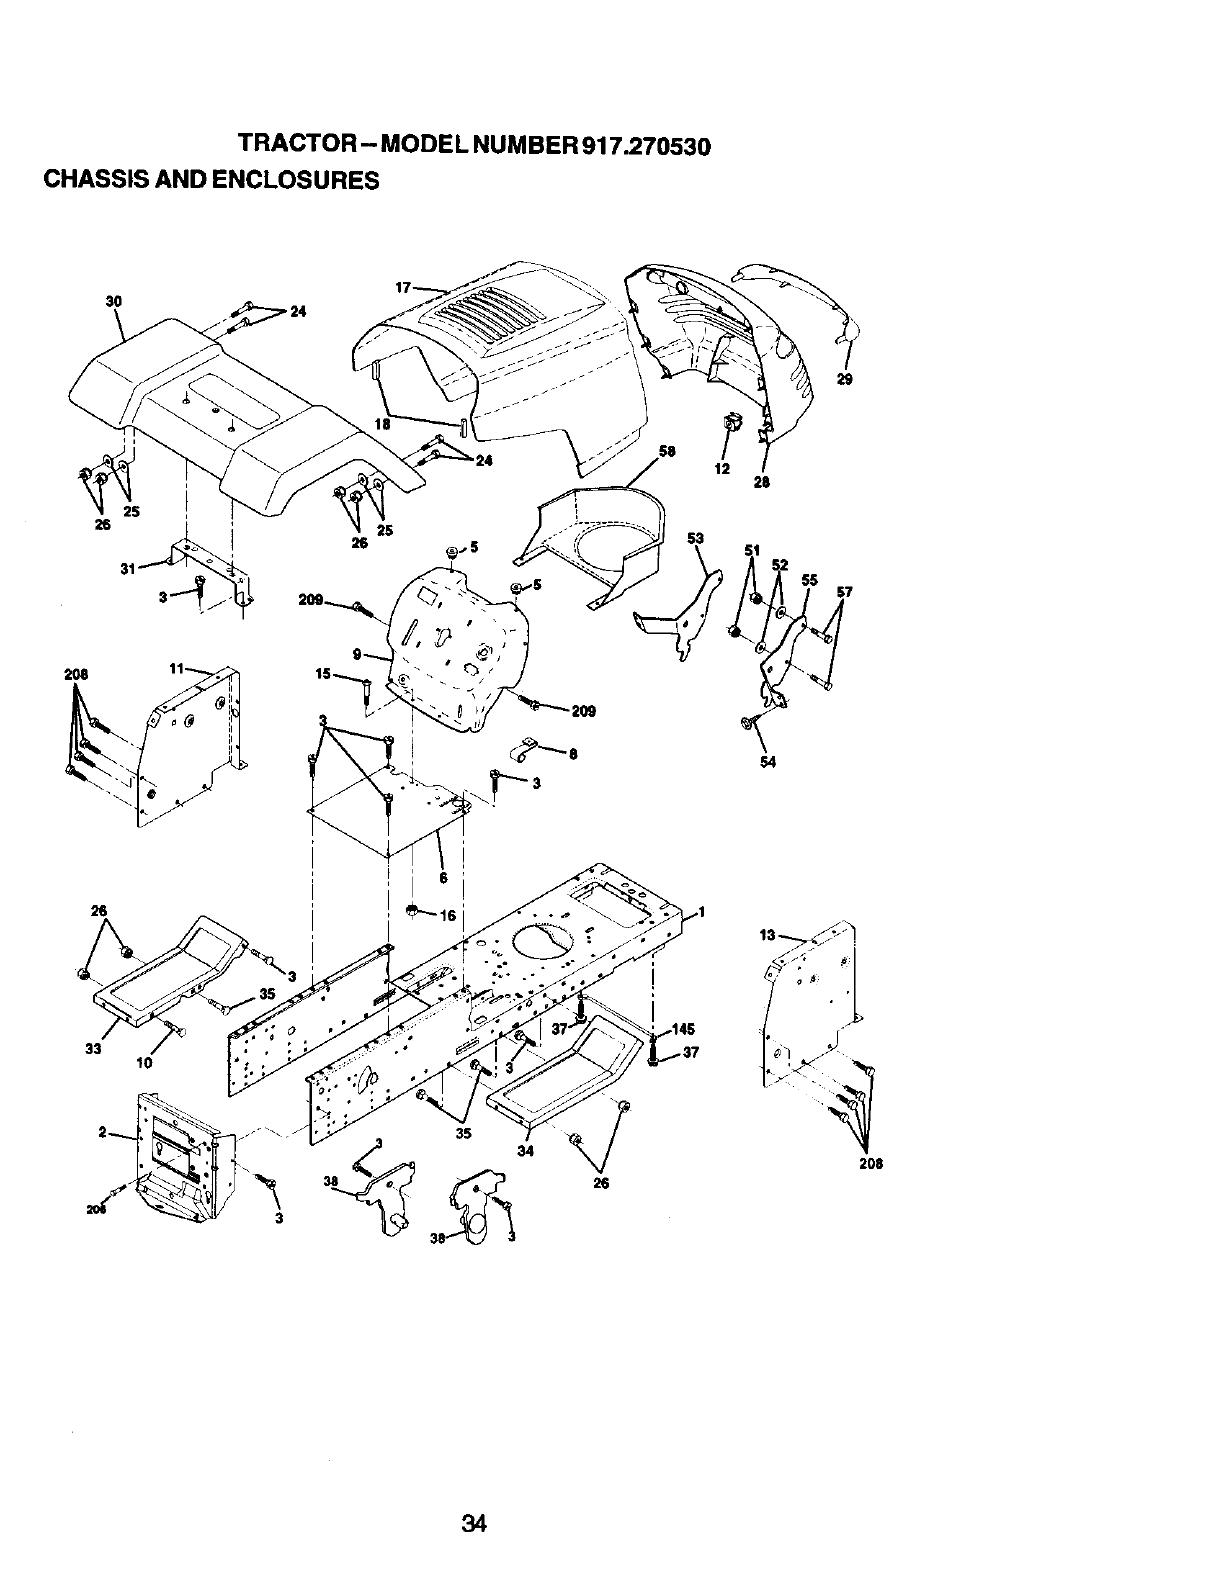 Craftsman 917270530 User Manual 14.5HP 42 MOWER LAWN